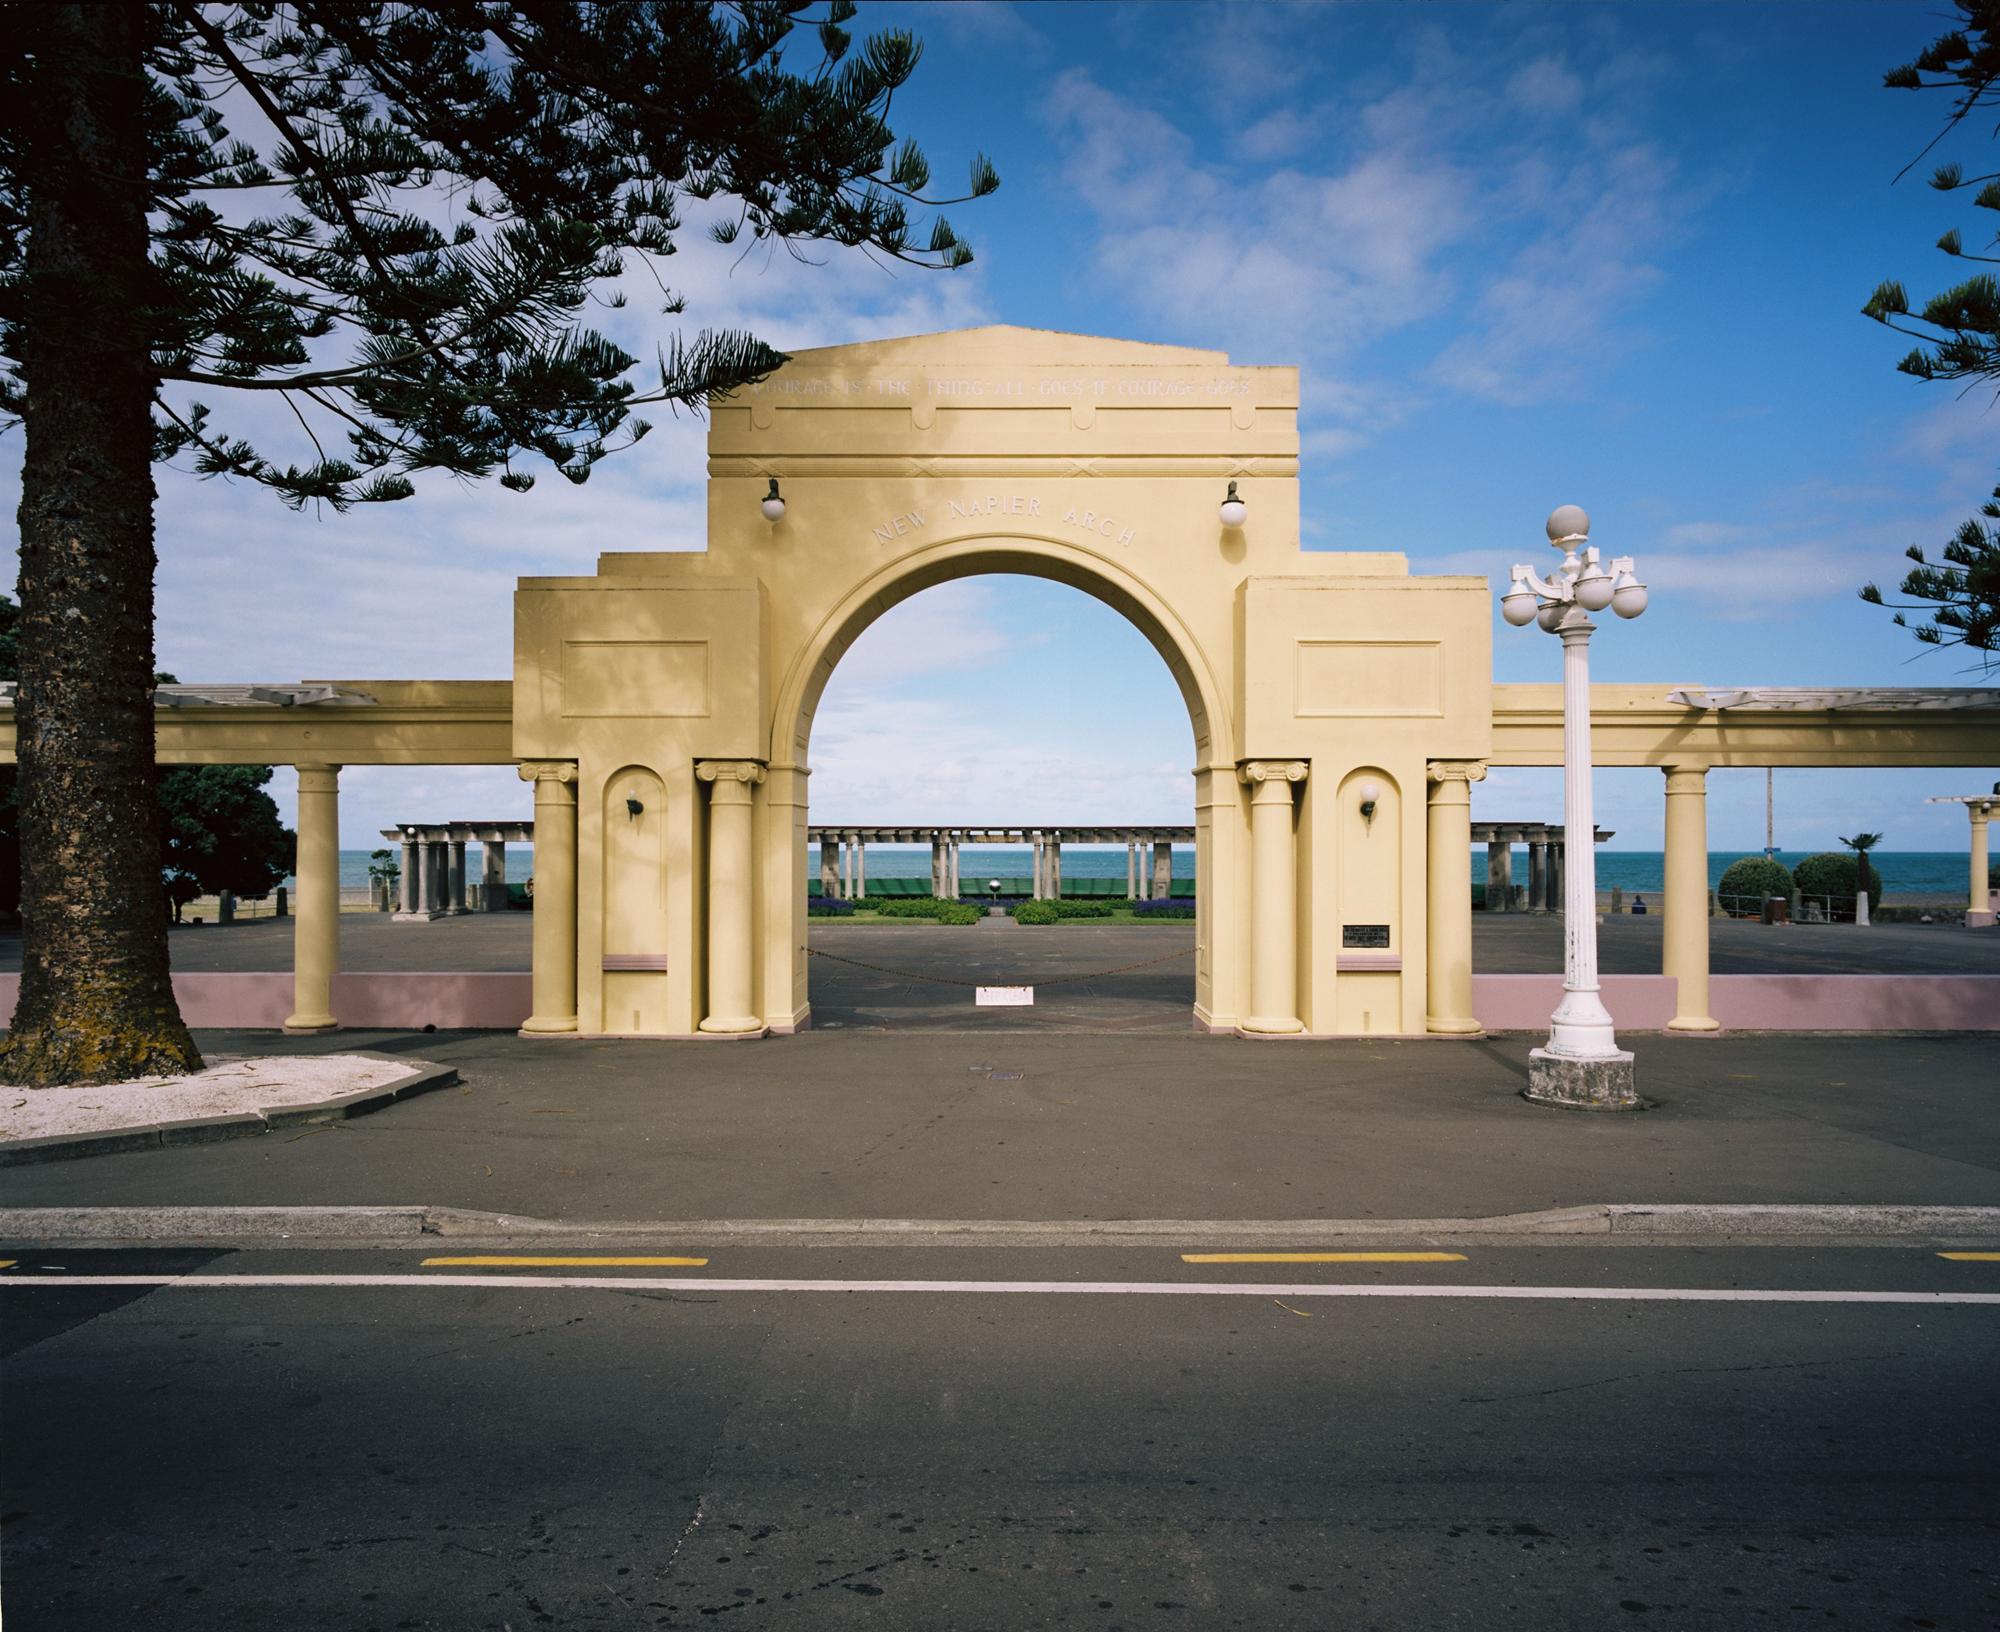 New Napier Arch